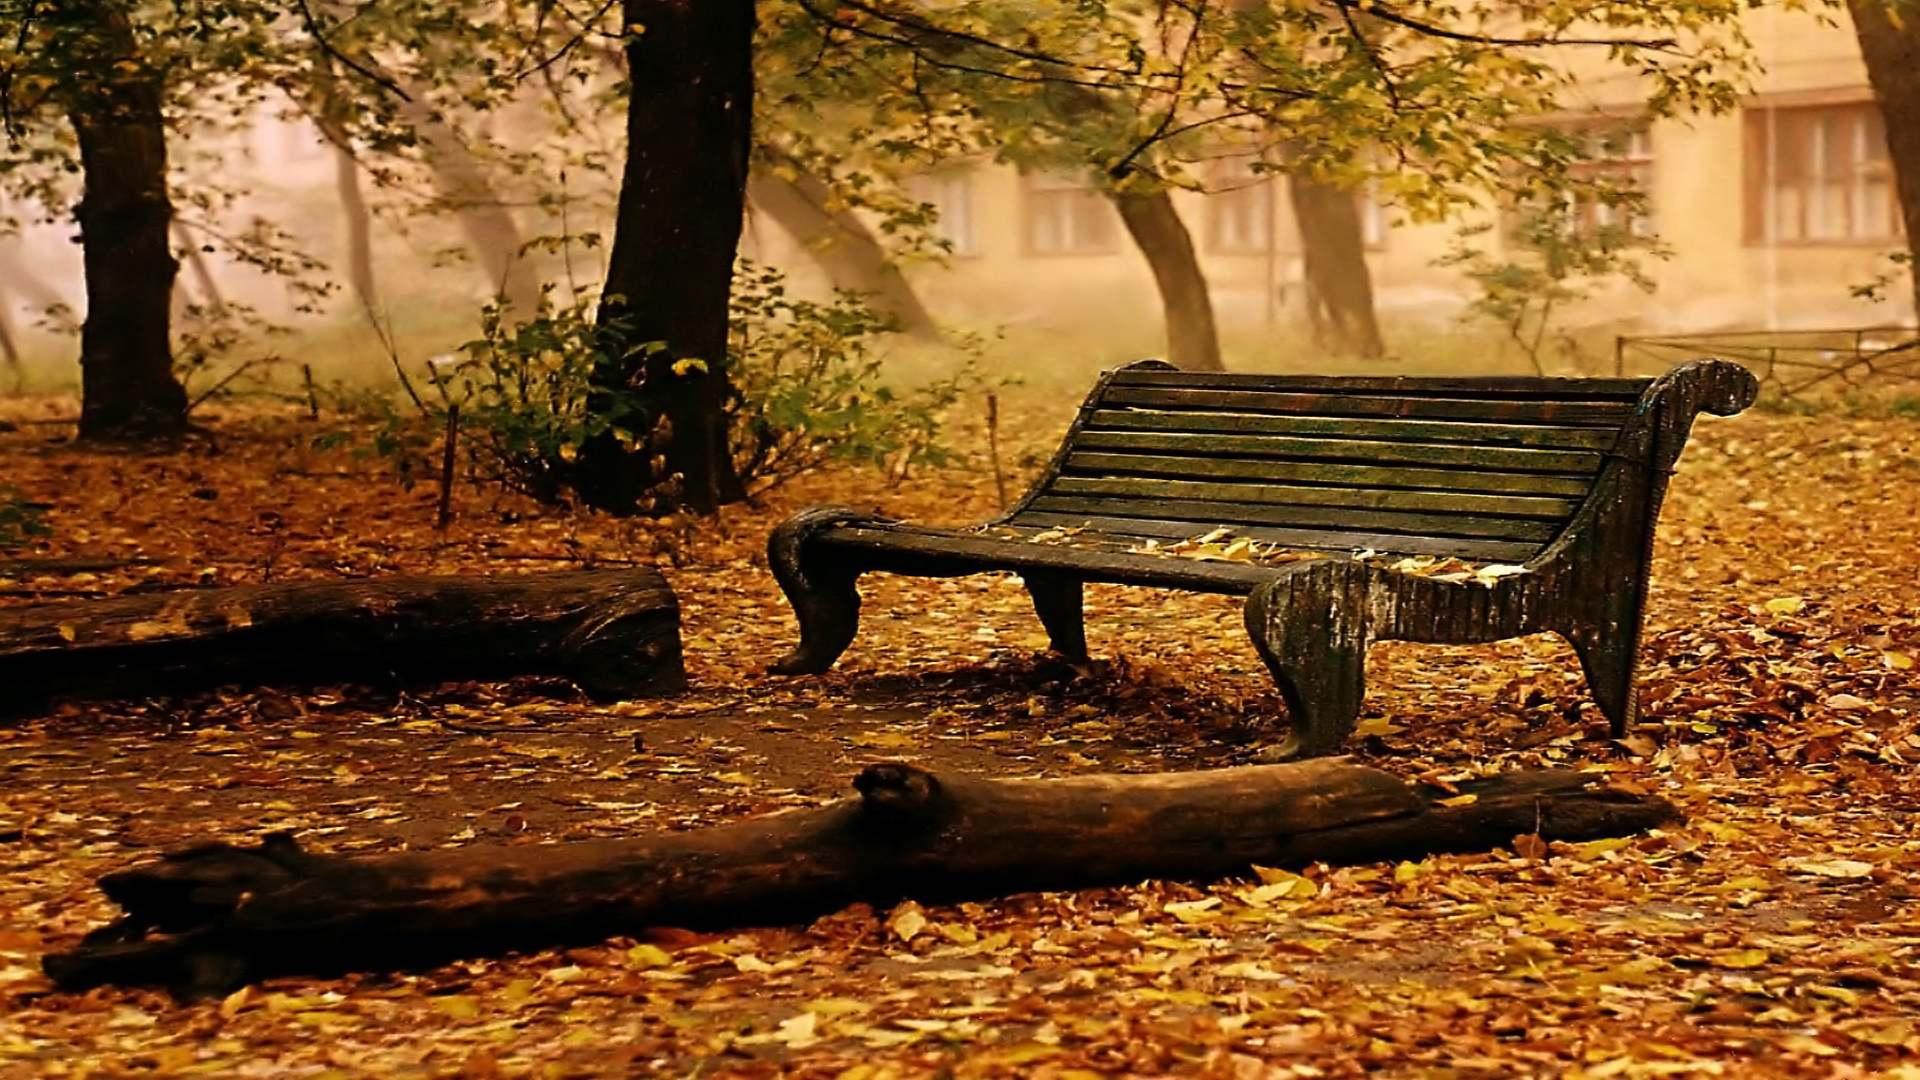 Fall Foliage Wallpaper All Free Download Wallpaper Hd Pixelstalk Net